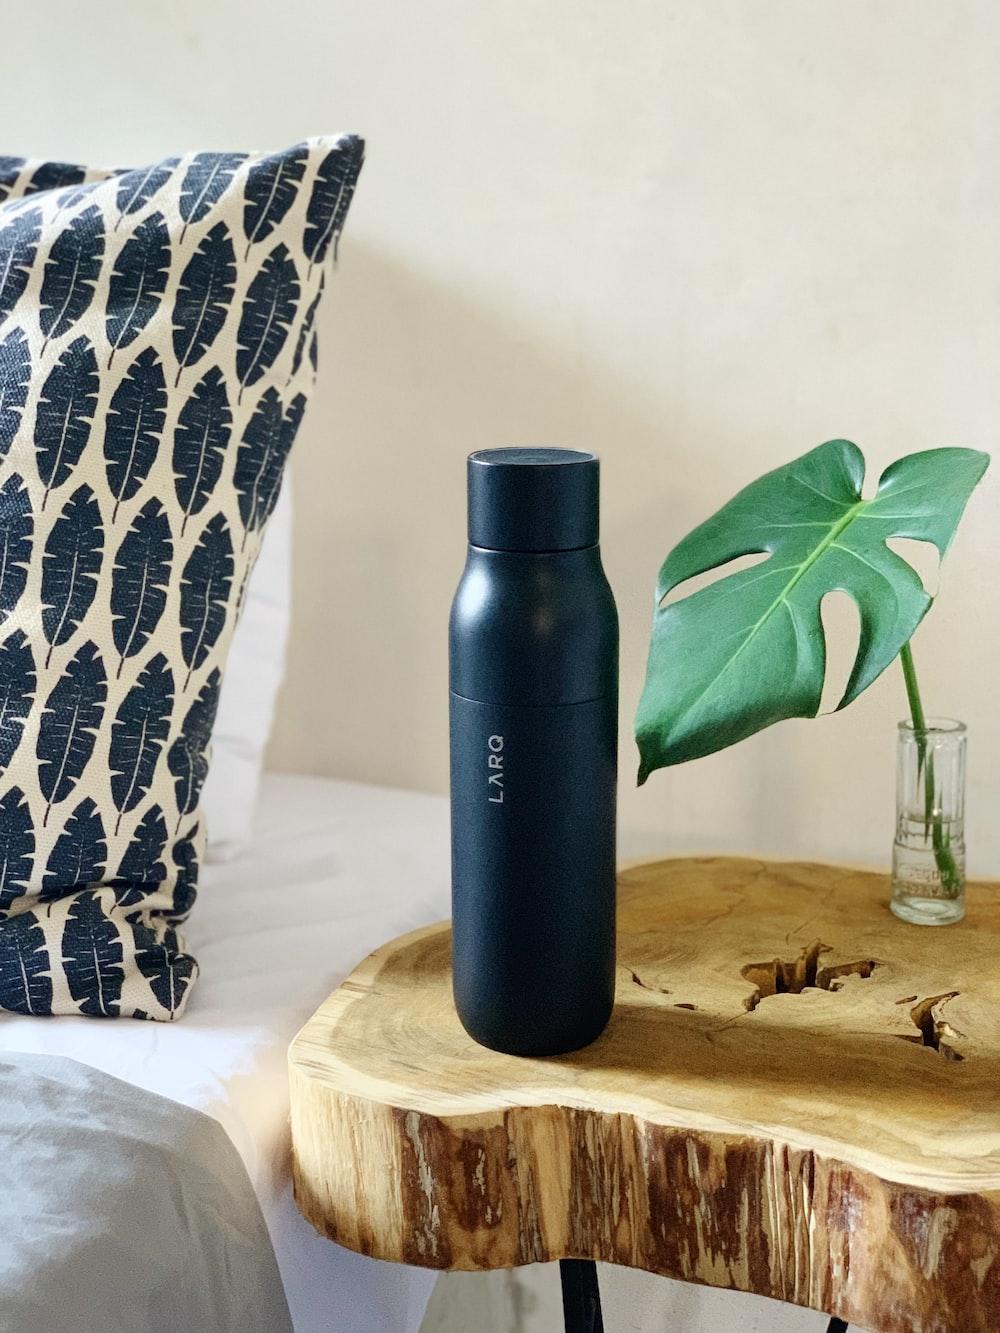 black Larq insulated bottle on wood slice table